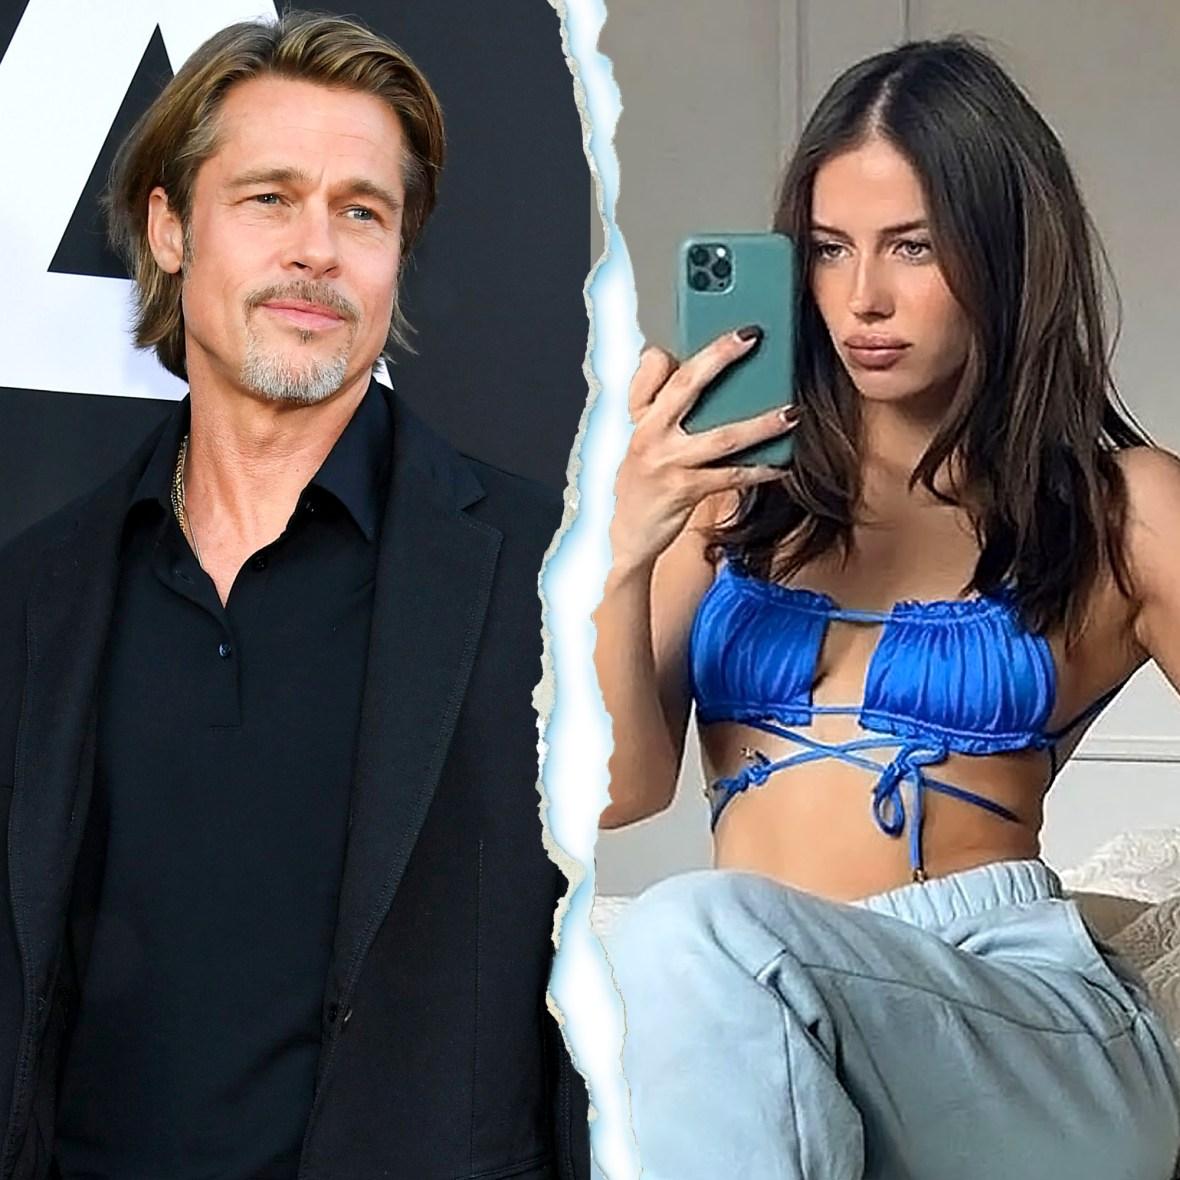 Brad Pitt Is Upset After Split From Model Girlfriend Nicole Poturalski